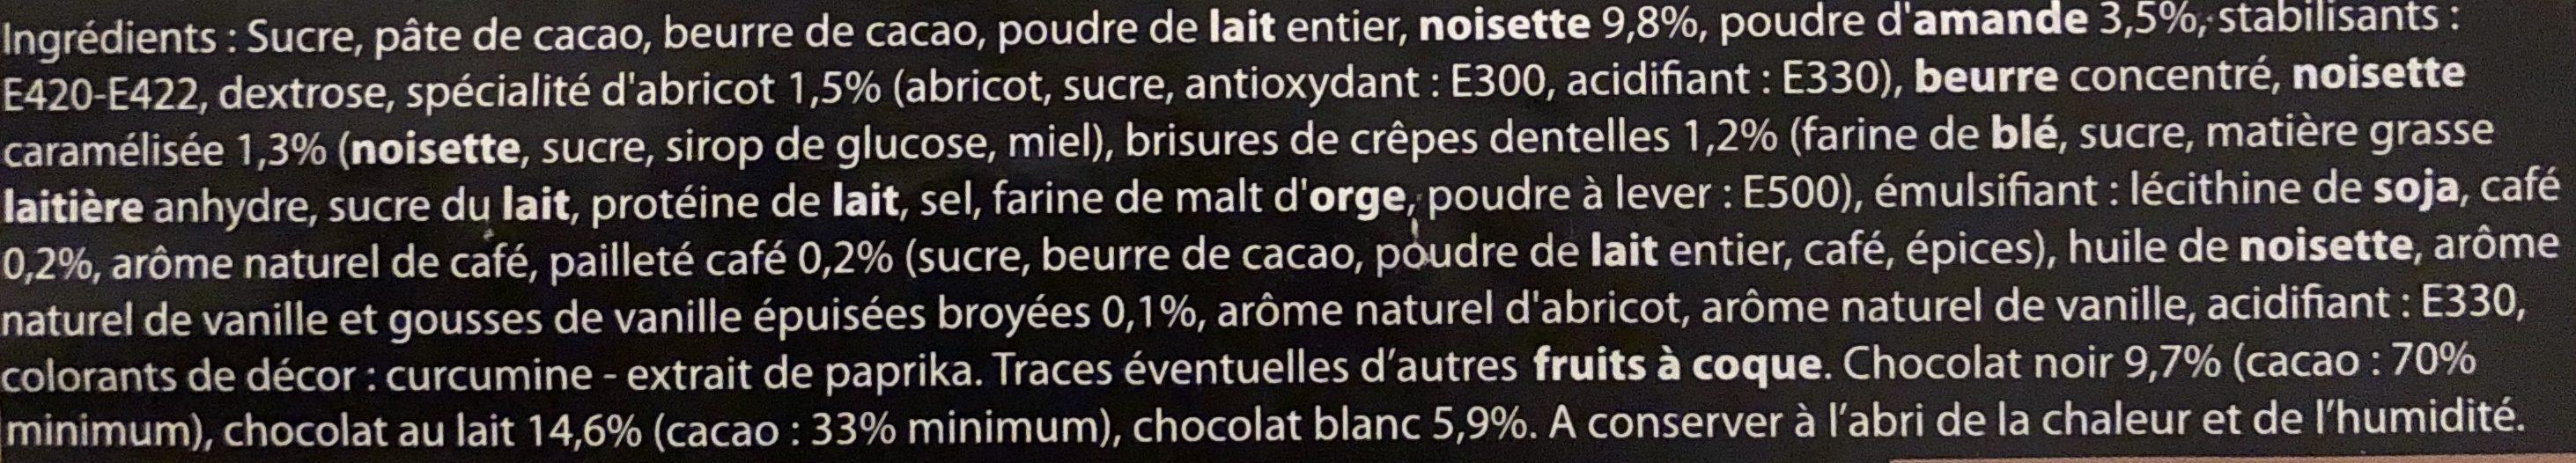 Chocolats - Ingredients